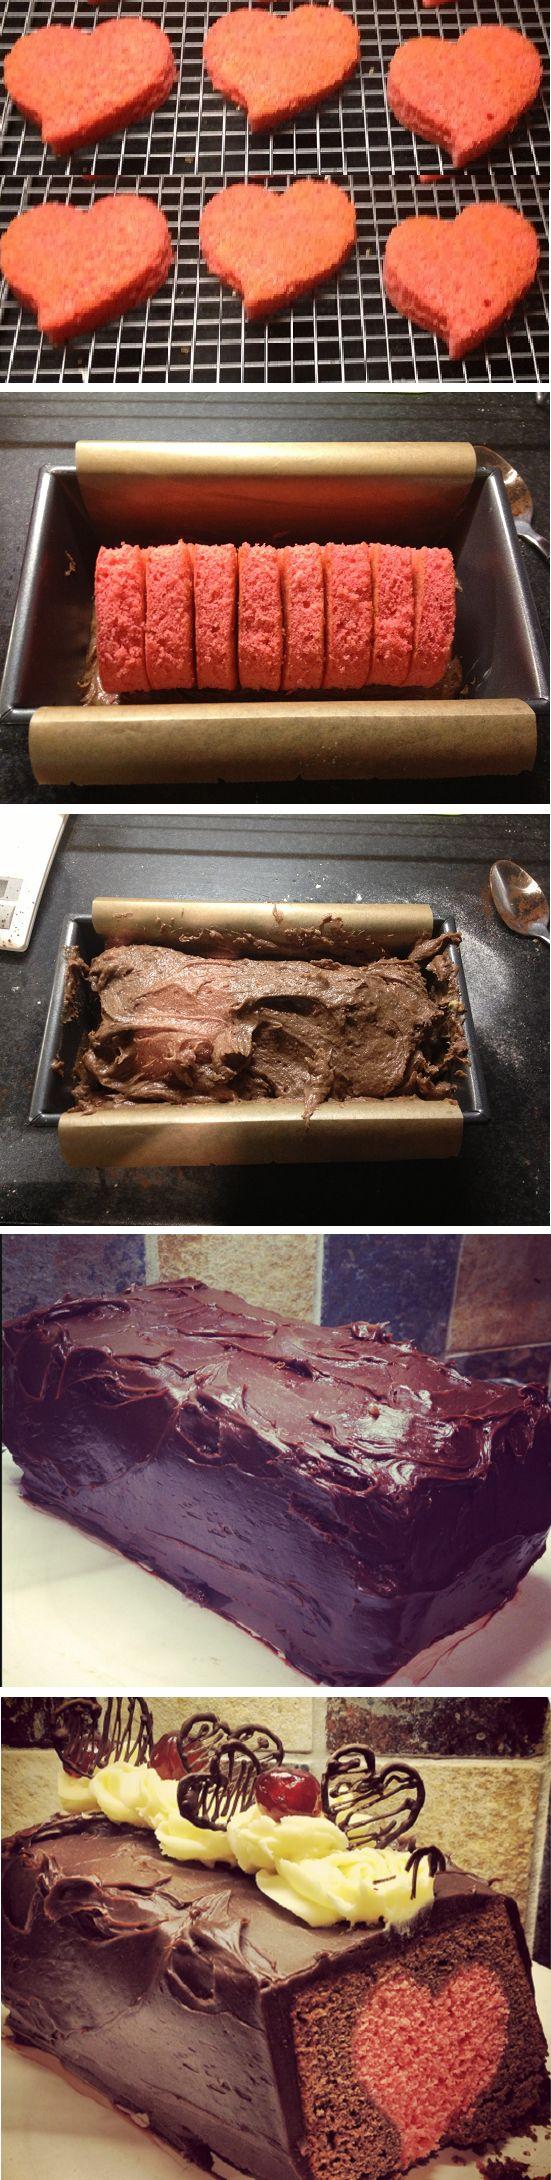 Hidden love heart chocolate suprise cake - Cupcakepedia